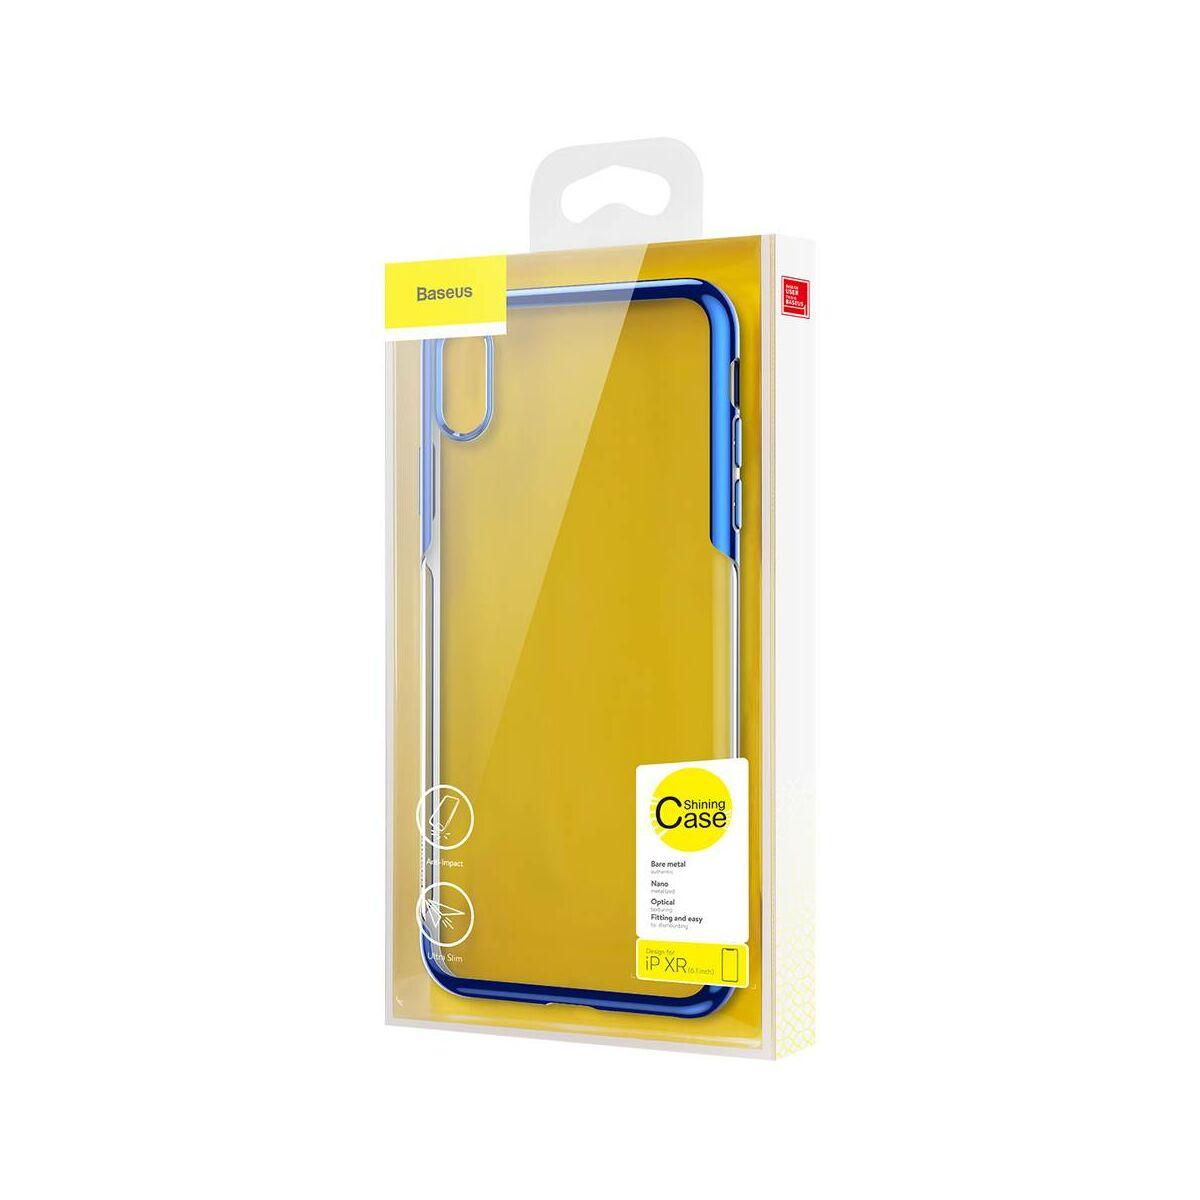 Baseus iPhone XR tok, Shining, kék (ARAPIPH61-MD03)